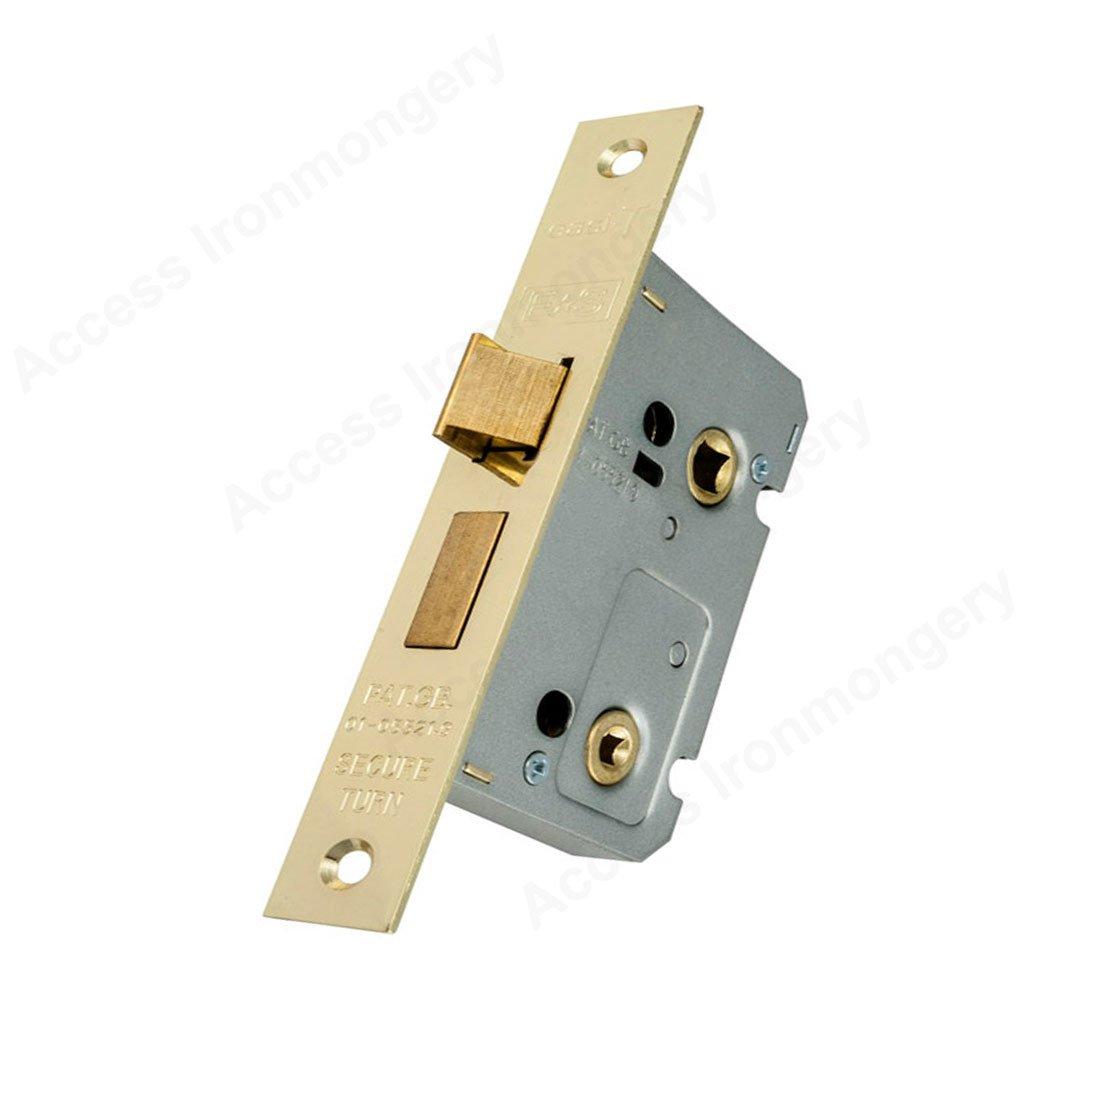 Carlisle Brass - BAE5025EB - EUROSPEC - Contract Locks Easi - T Contract Bathroom Lock 64mm(2.5') - Finish - Electro Brassed (EB)